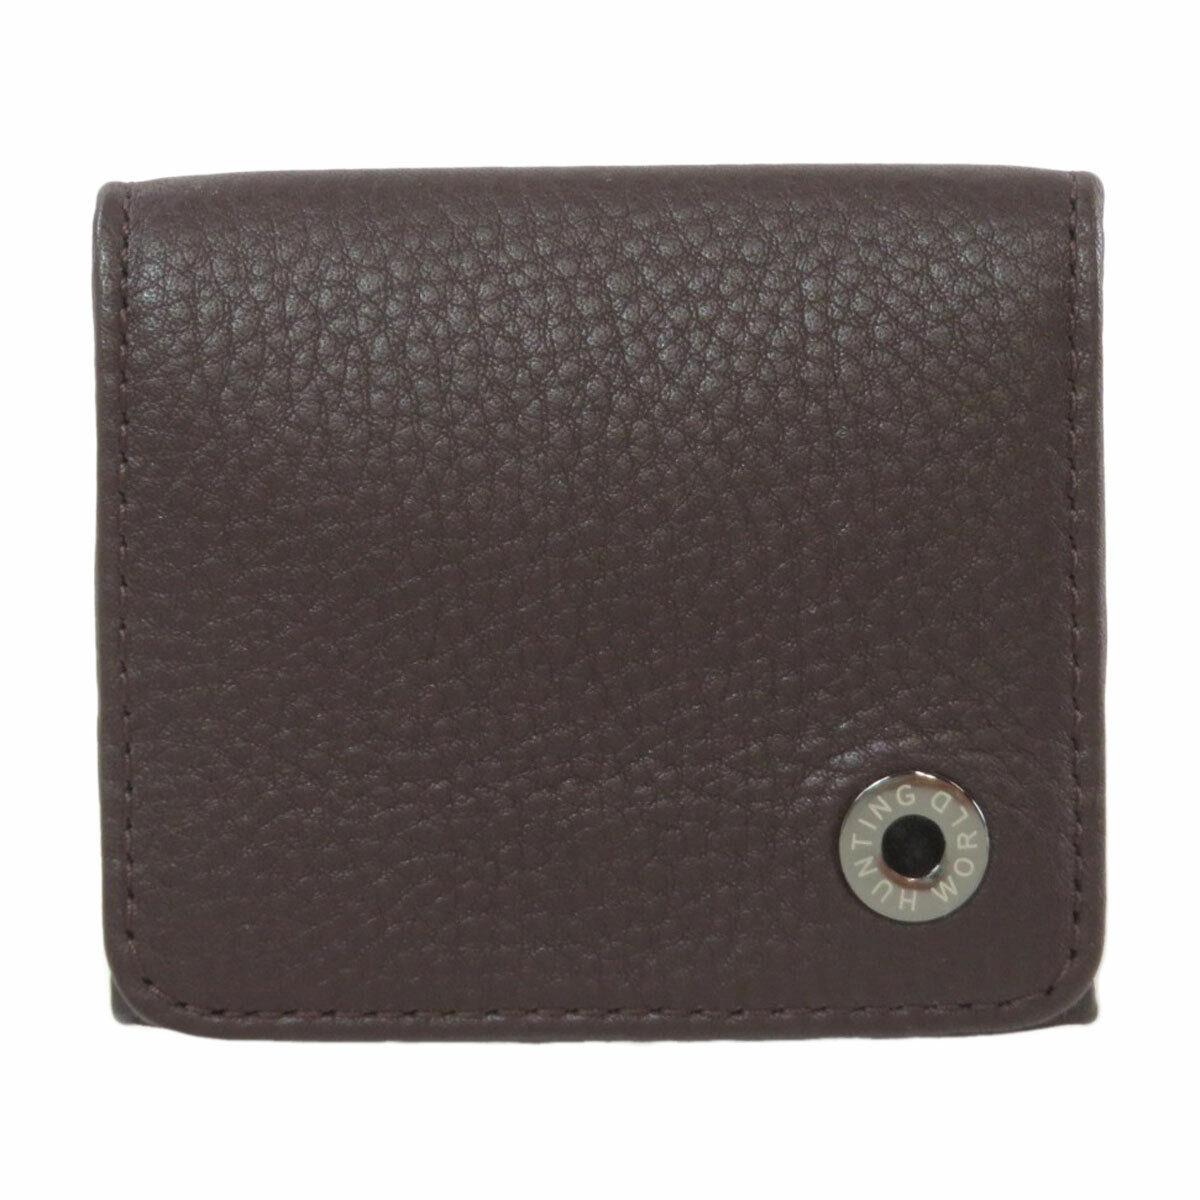 HUNTING WORLD coin purse Logo Hardware Leather